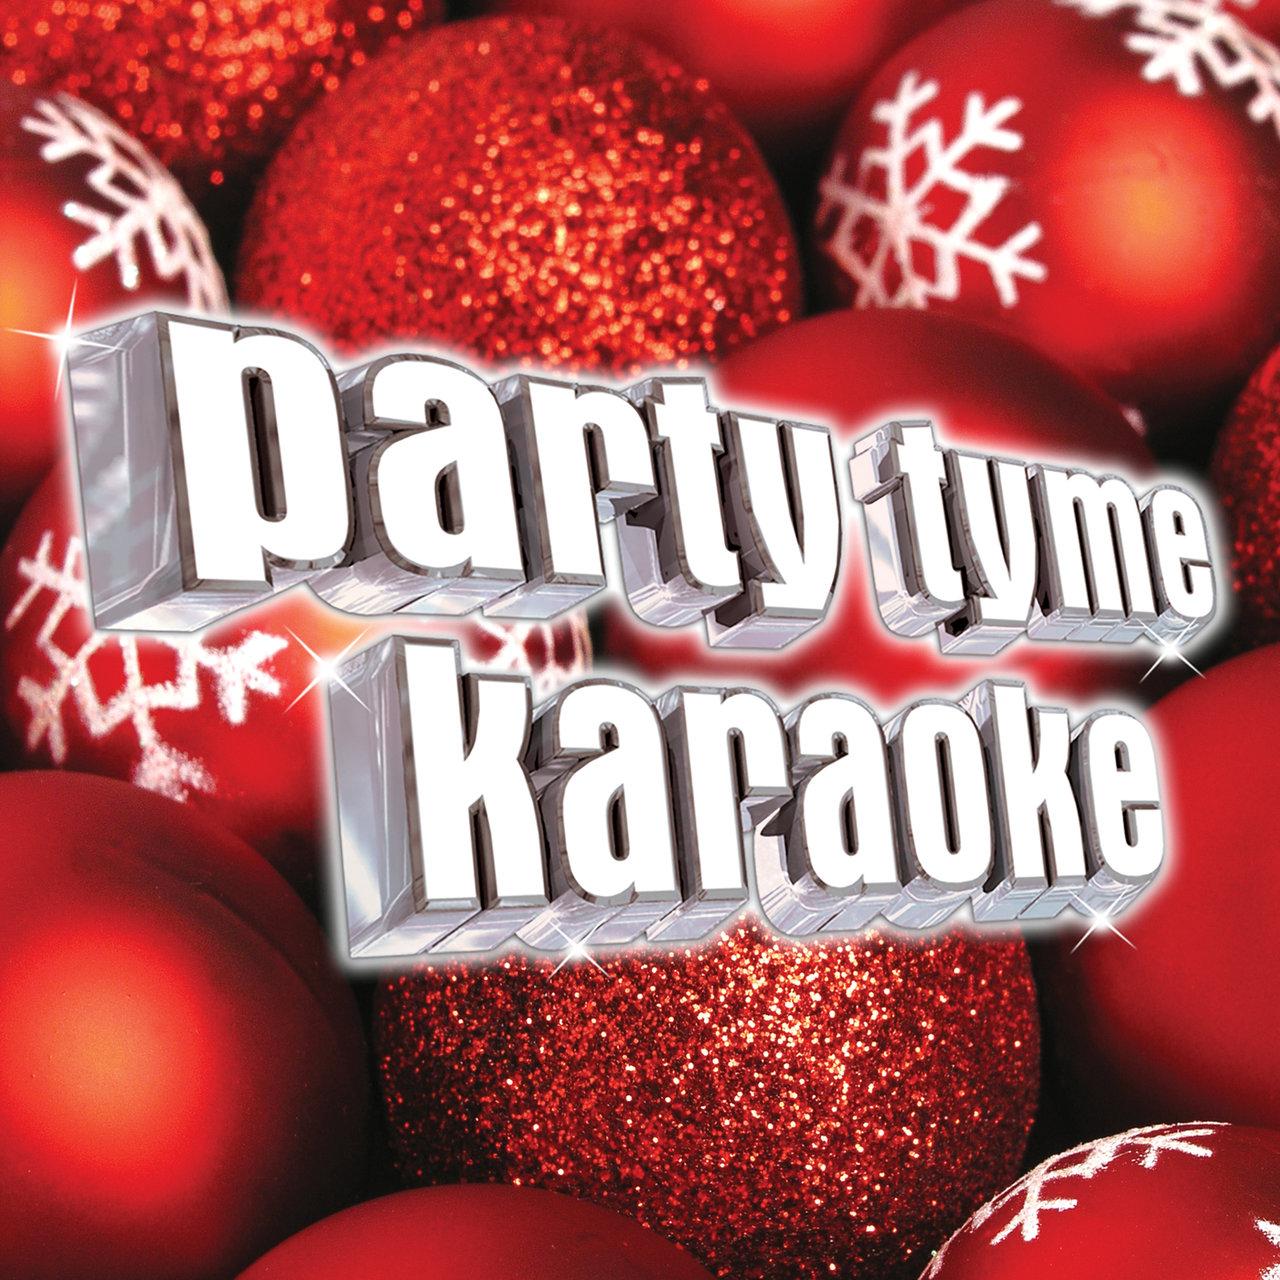 TIDAL: Listen to Party Tyme Karaoke on TIDAL